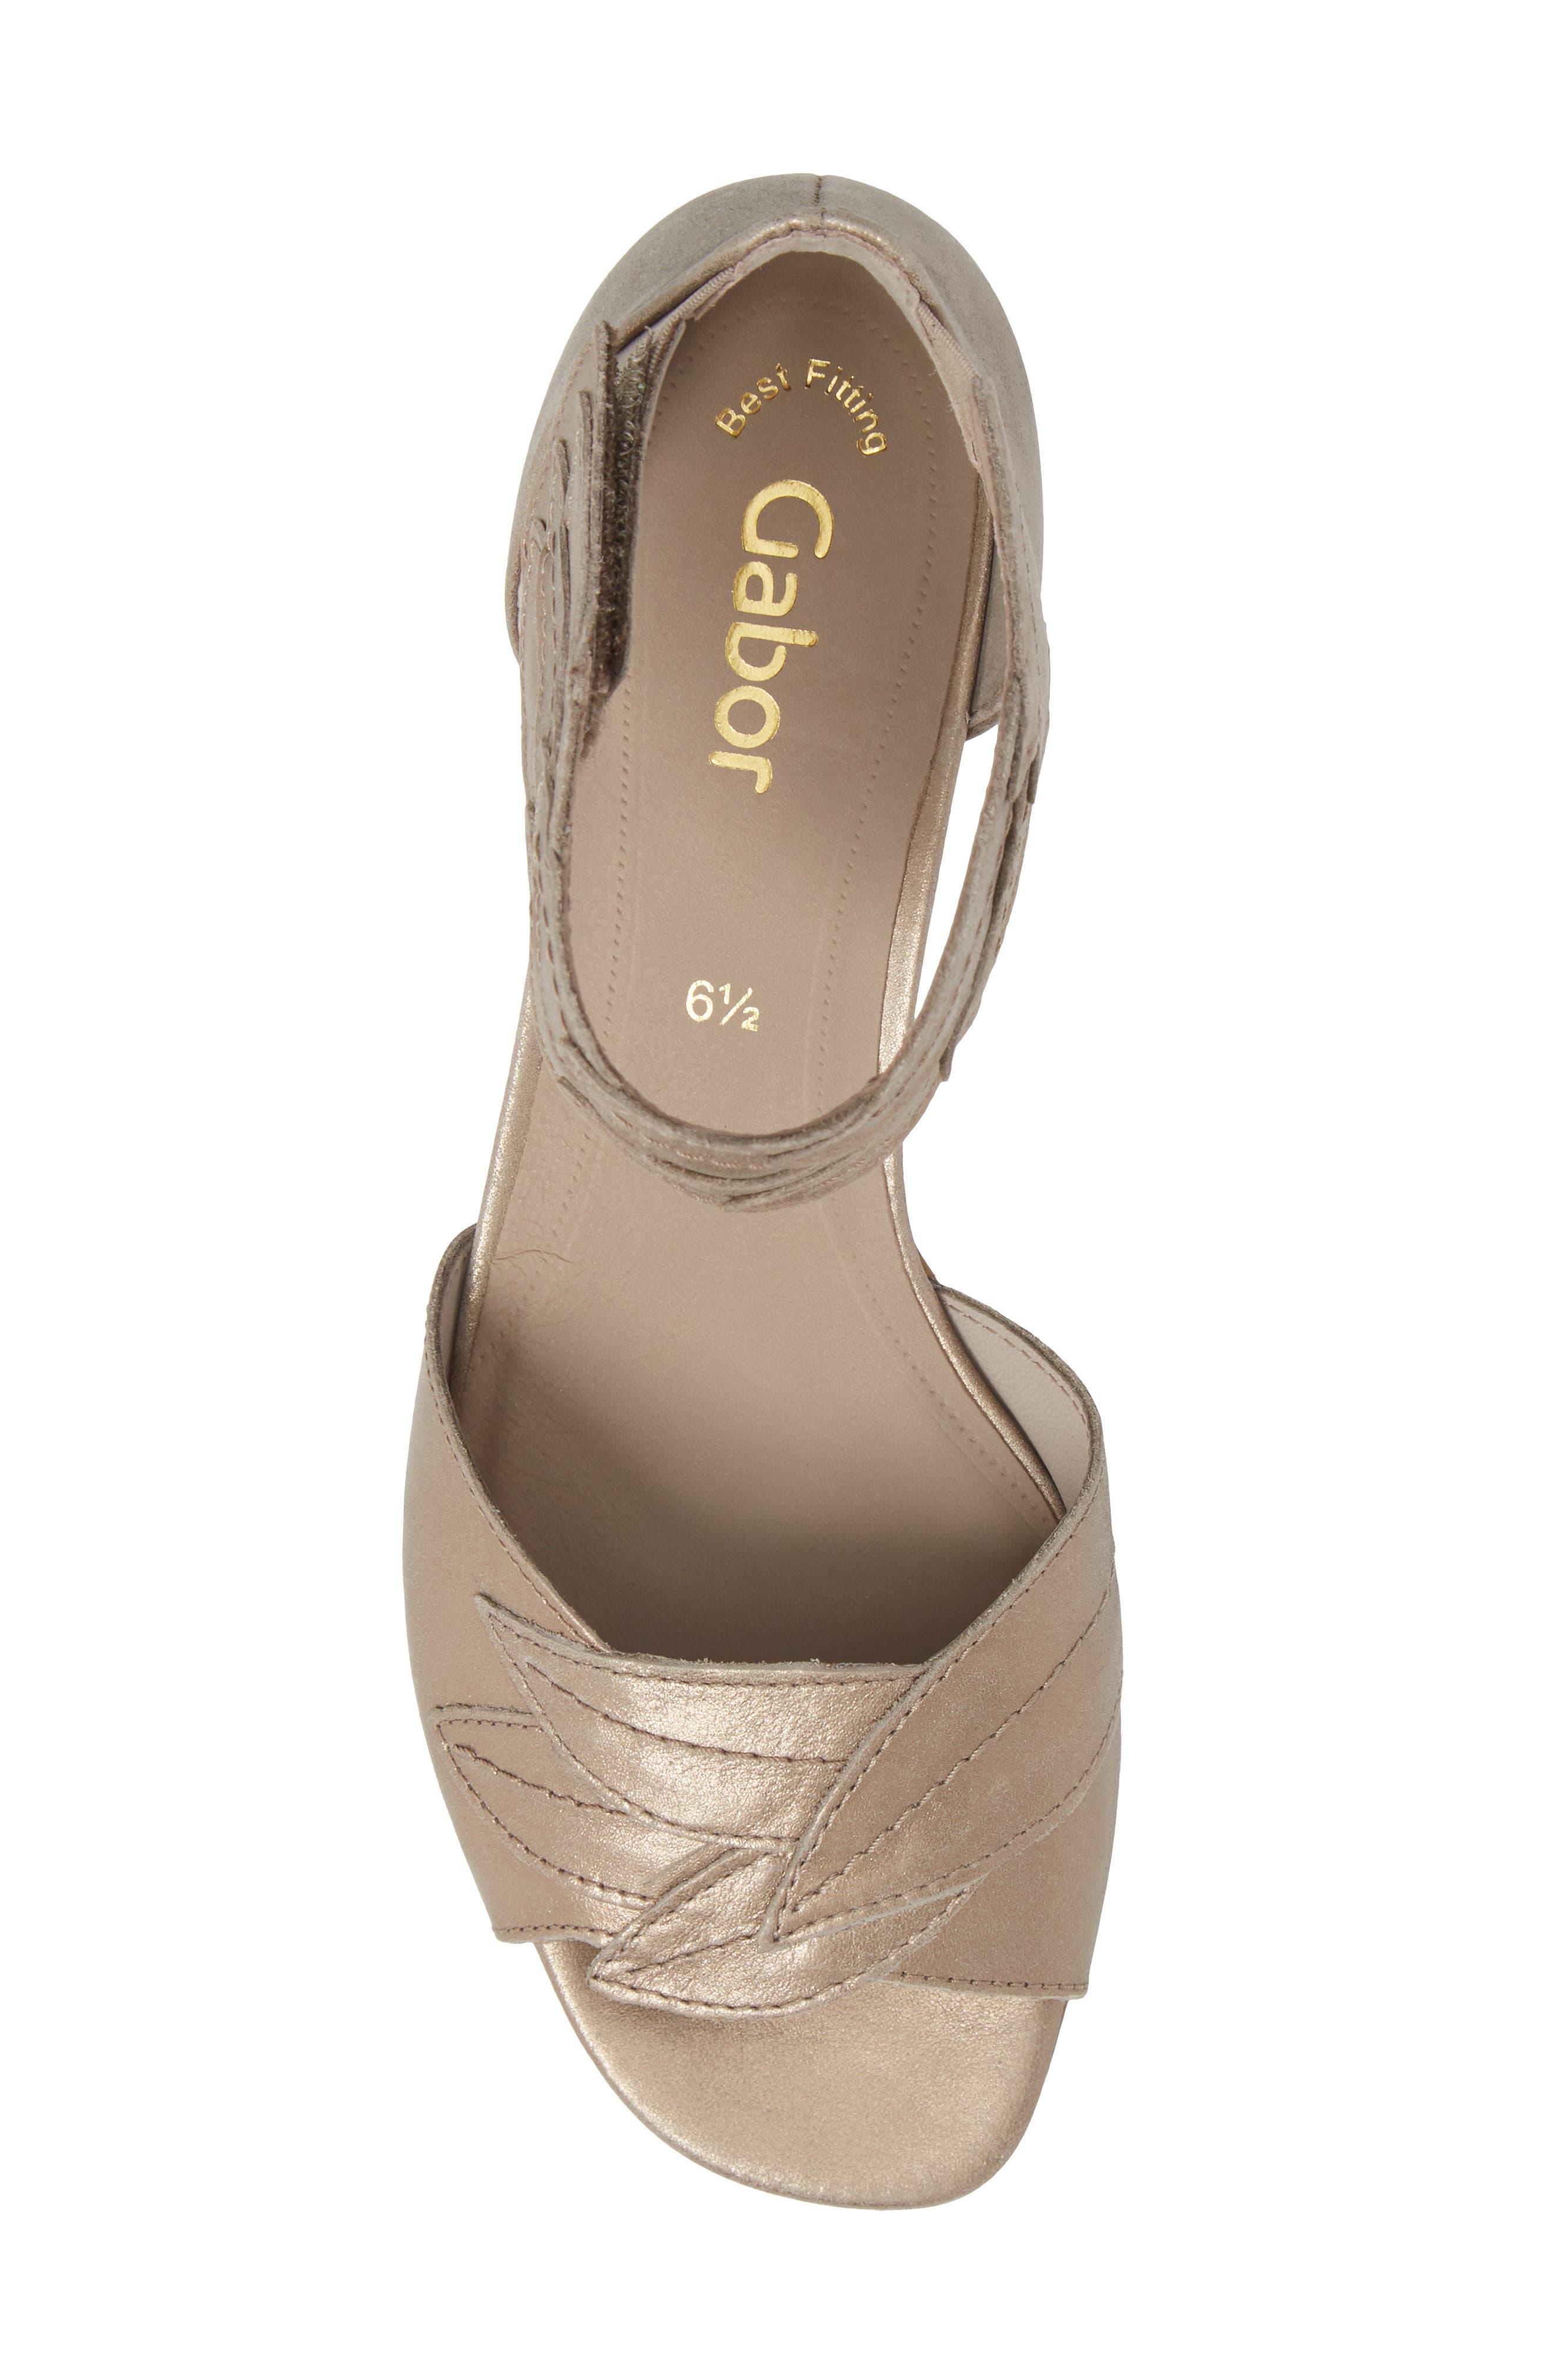 Leaf Ankle Strap Sandal,                             Alternate thumbnail 5, color,                             Beige Metallic Leather